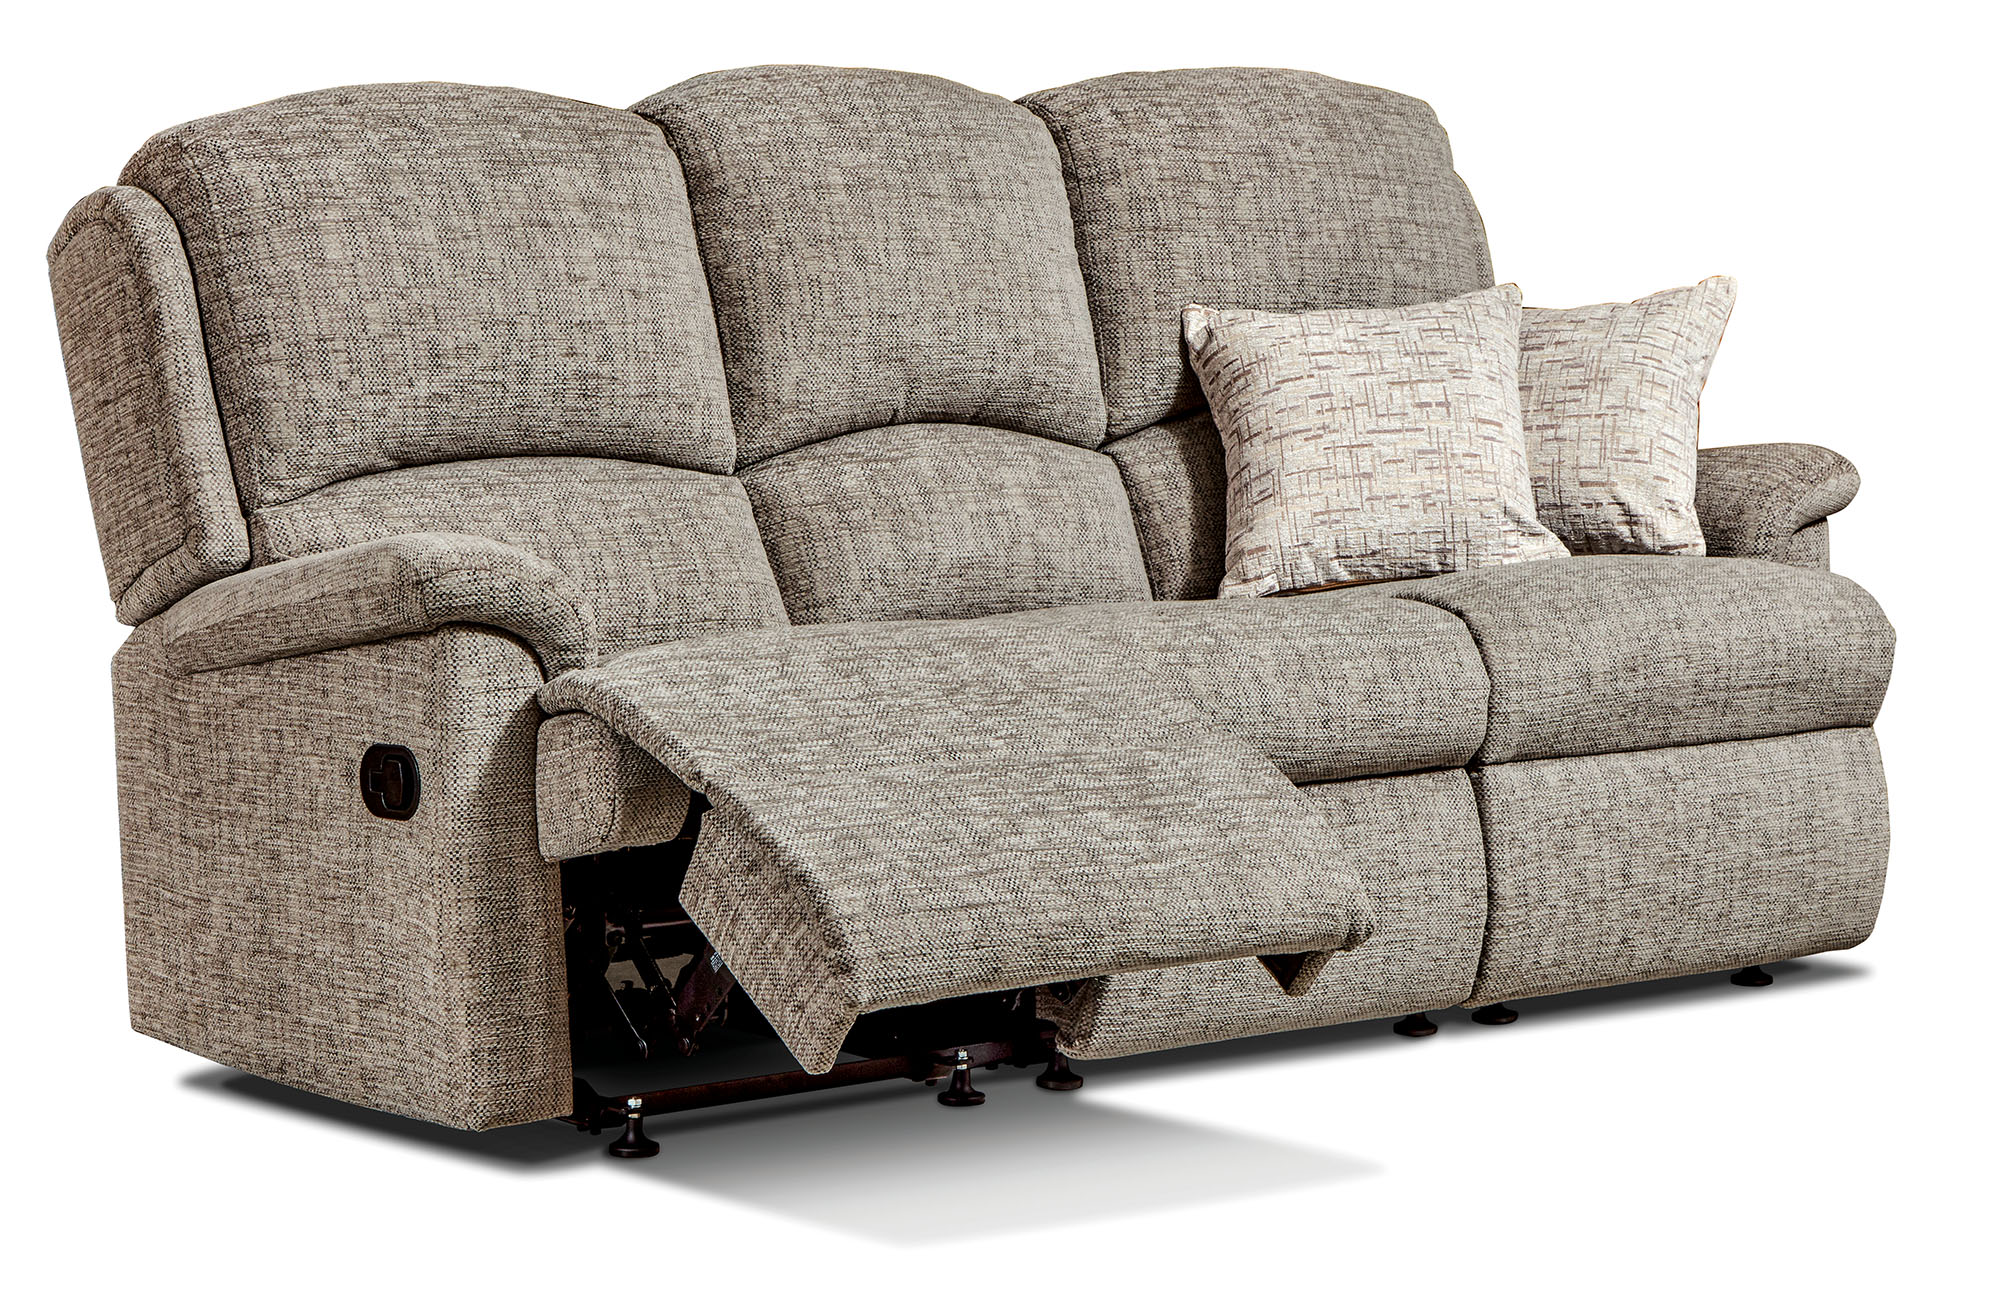 Virginia 3 seater recliner